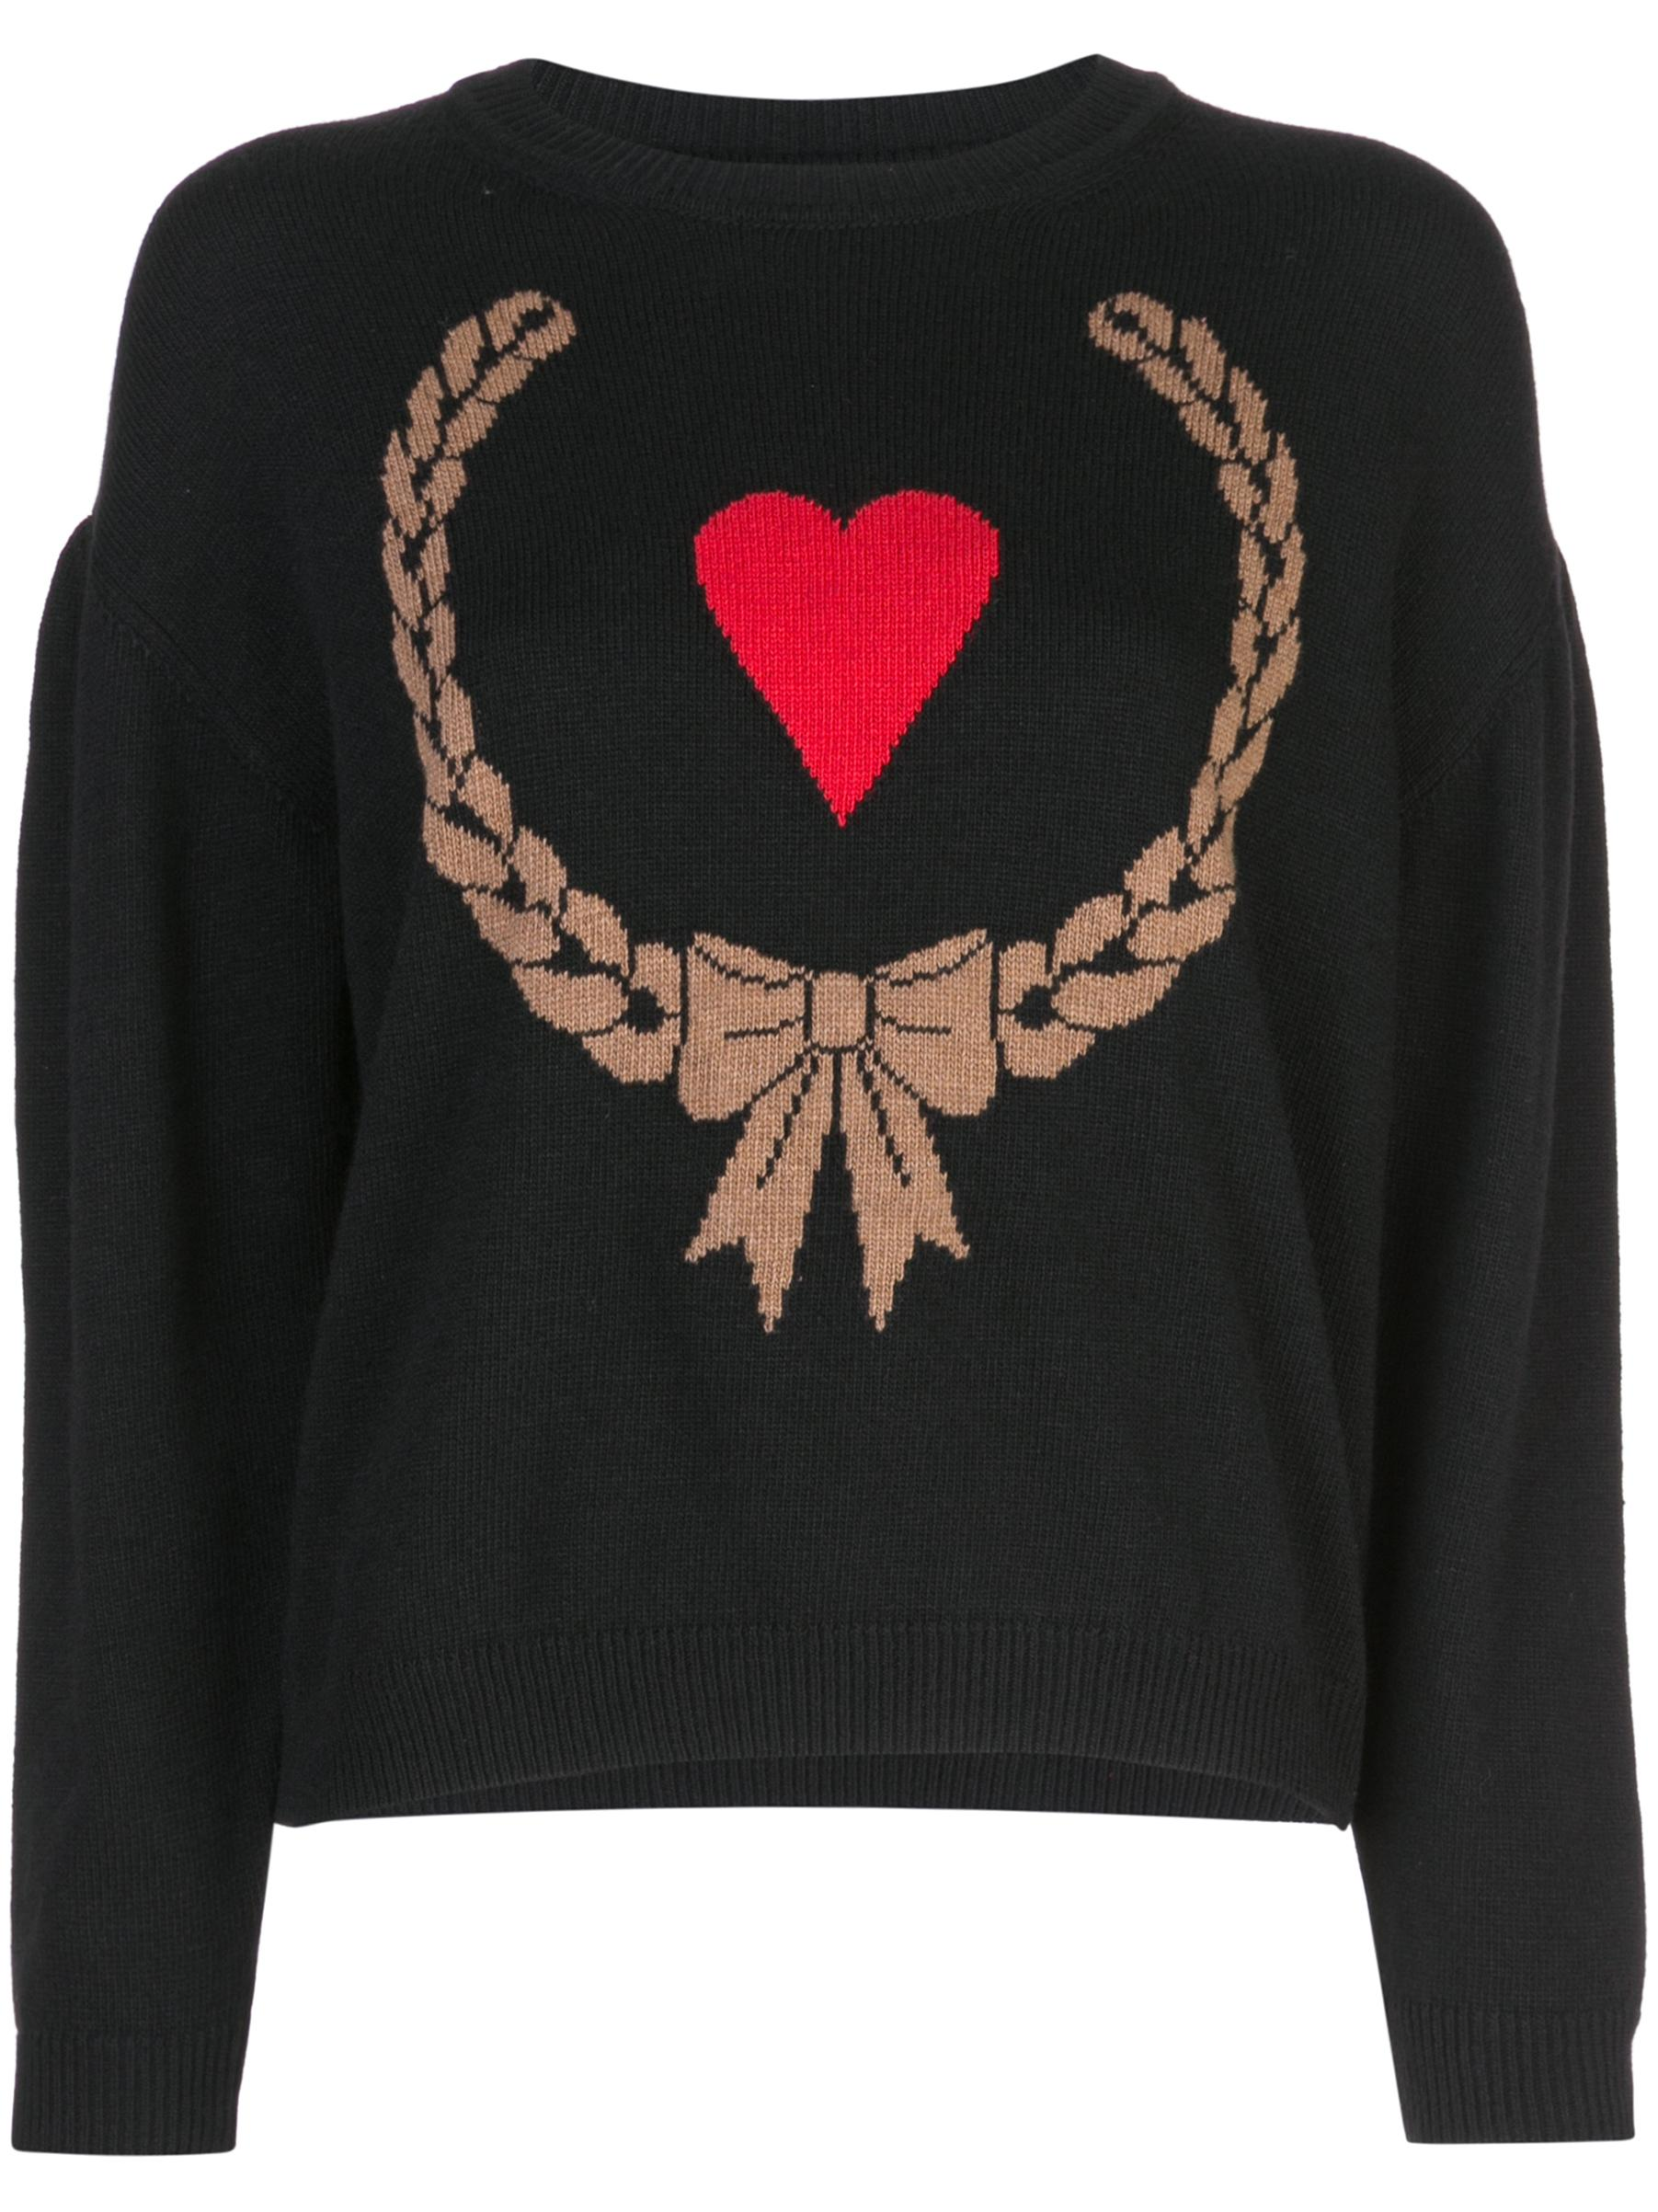 Long Sleeve Heart Graphic Print Sweater Item # 0921-6101